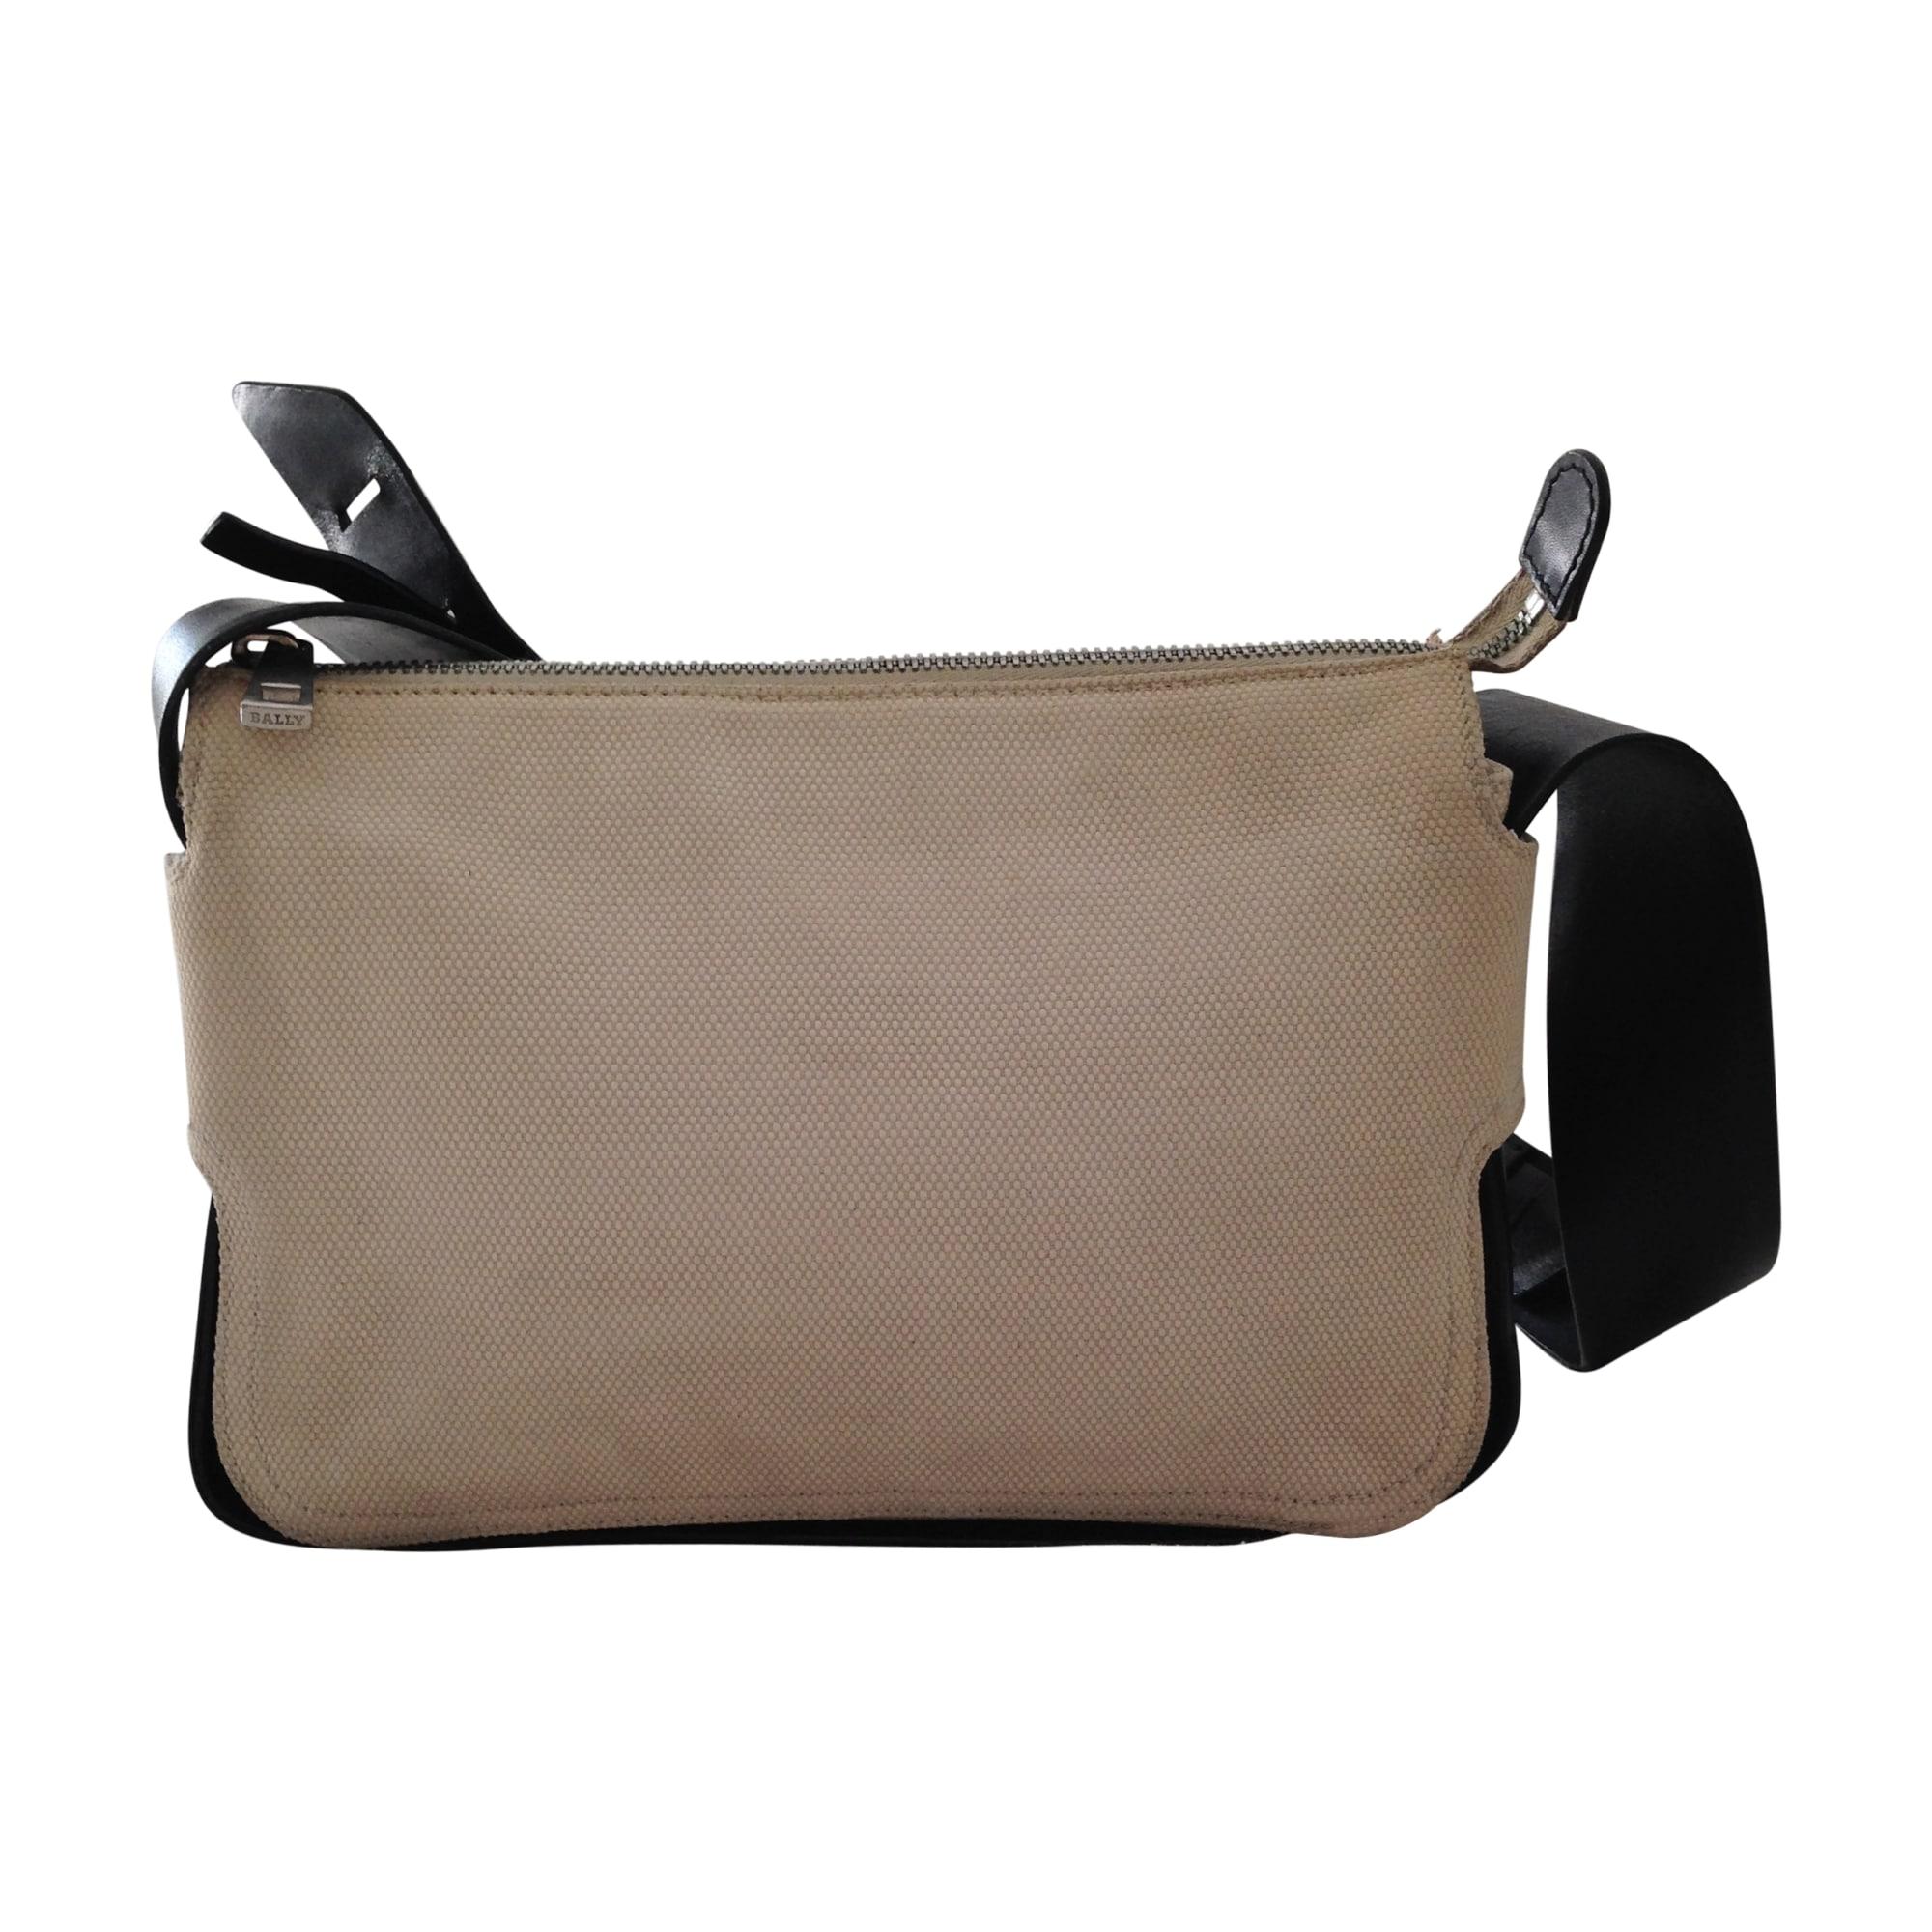 Lederhandtasche BALLY Beige